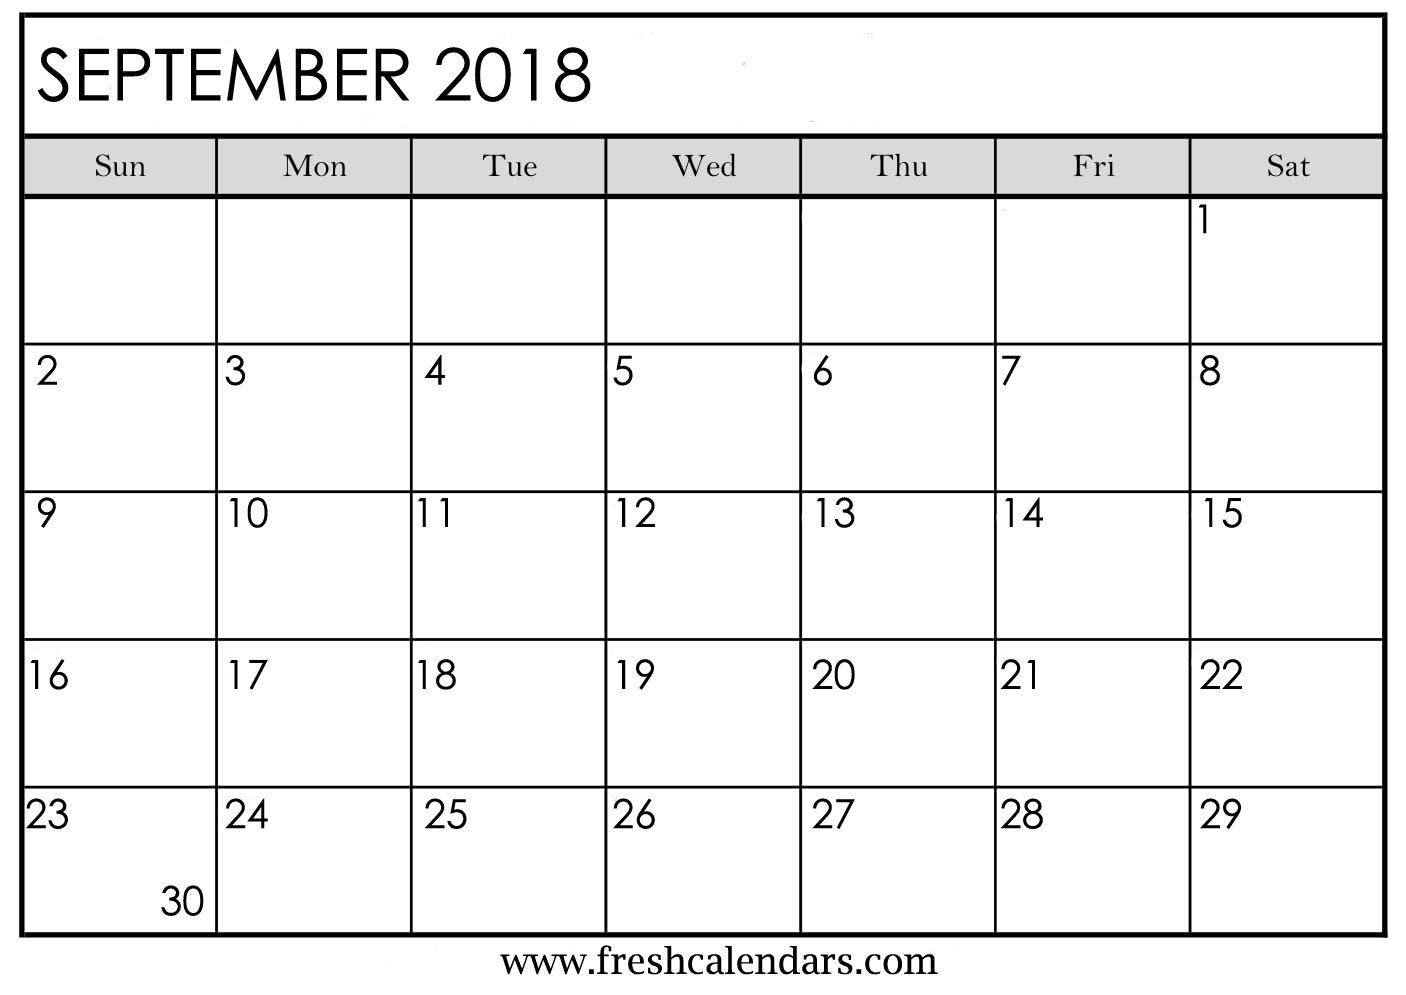 September 2018 Calendar Printable - Fresh Calendars in Blank Printable September Calendar Template